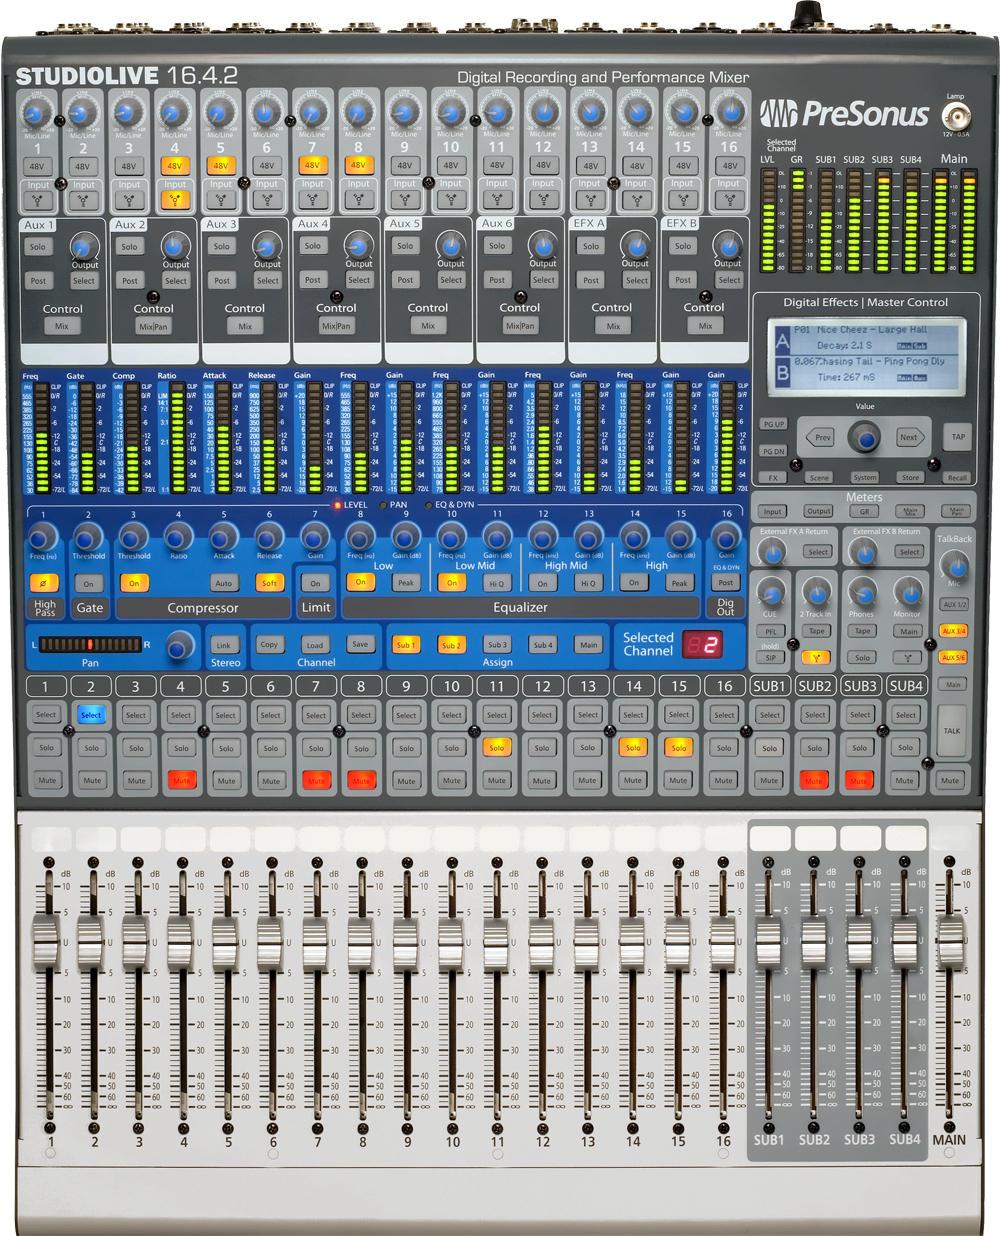 presonus studiolive 16 4 2 image 615332 audiofanzine rh en audiofanzine com PreSonus StudioLive 16.0.2 Case StudioLive Mixdown On